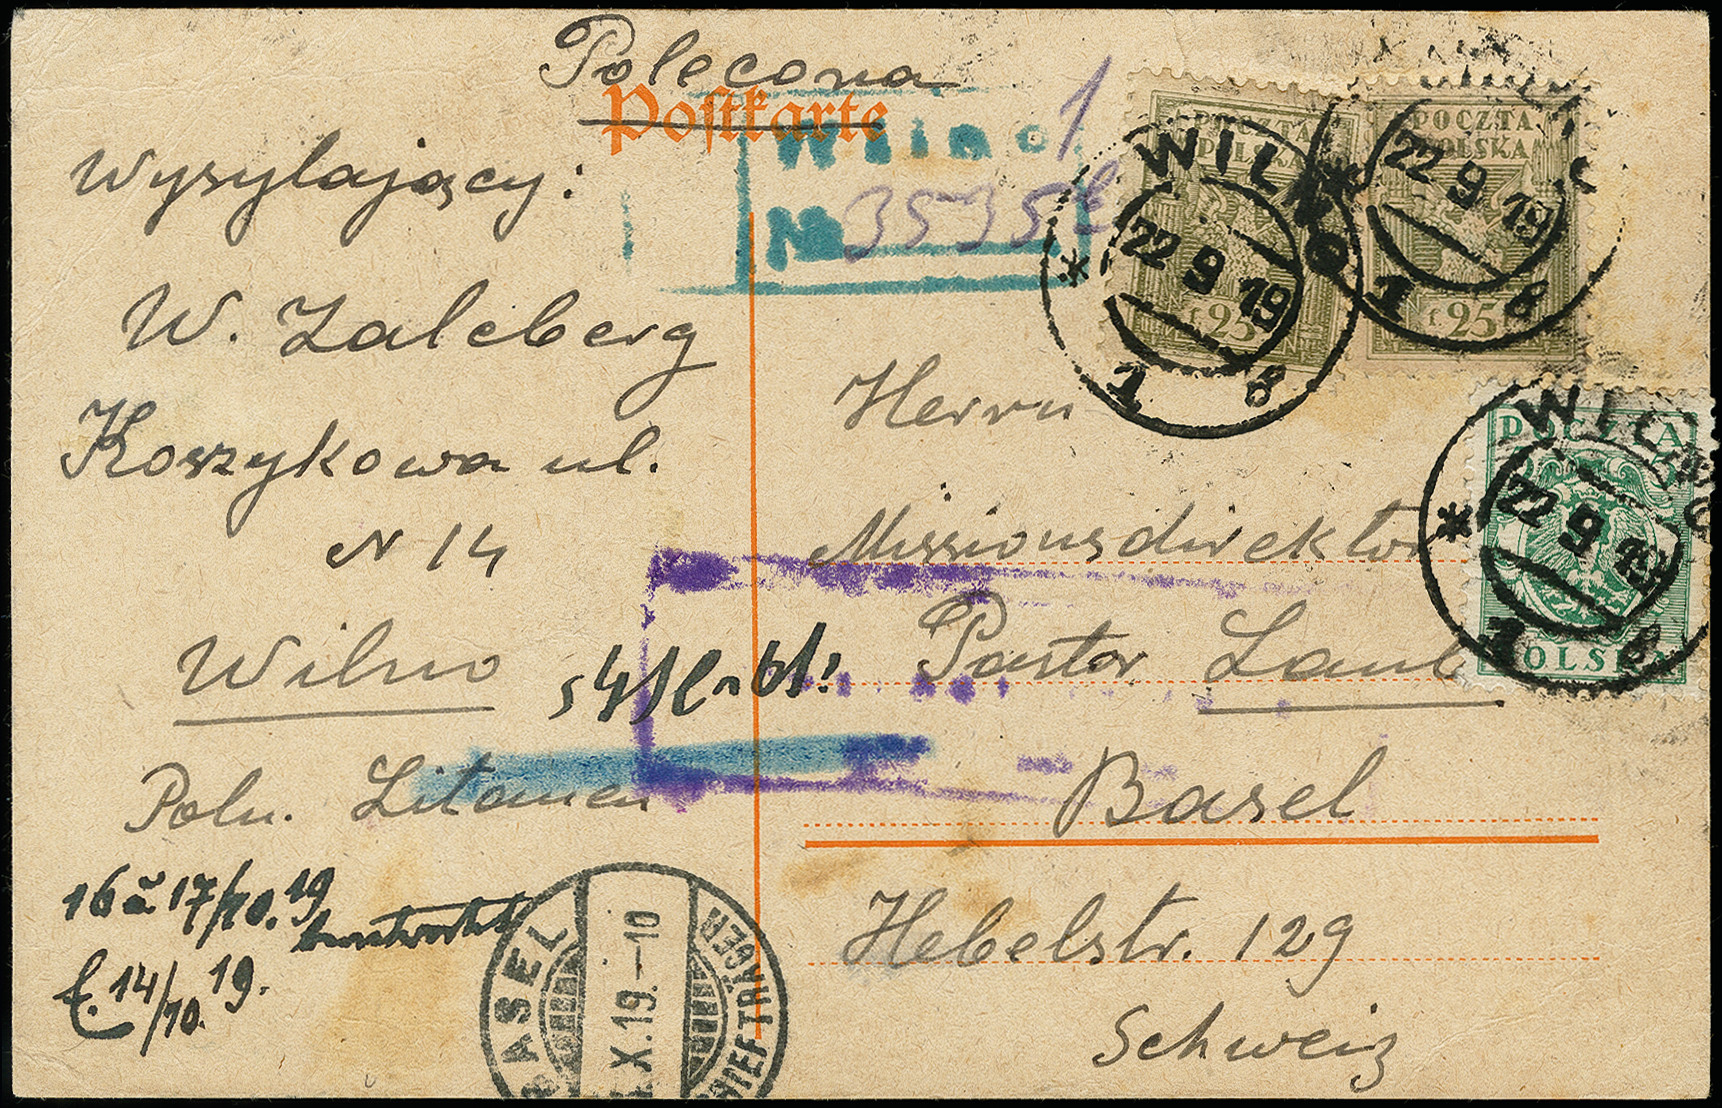 Lot 196 - europe Central Lithuania, Poland -  Heinrich Koehler Auktionen 373rd Heinrich Köhler auction - Day 1